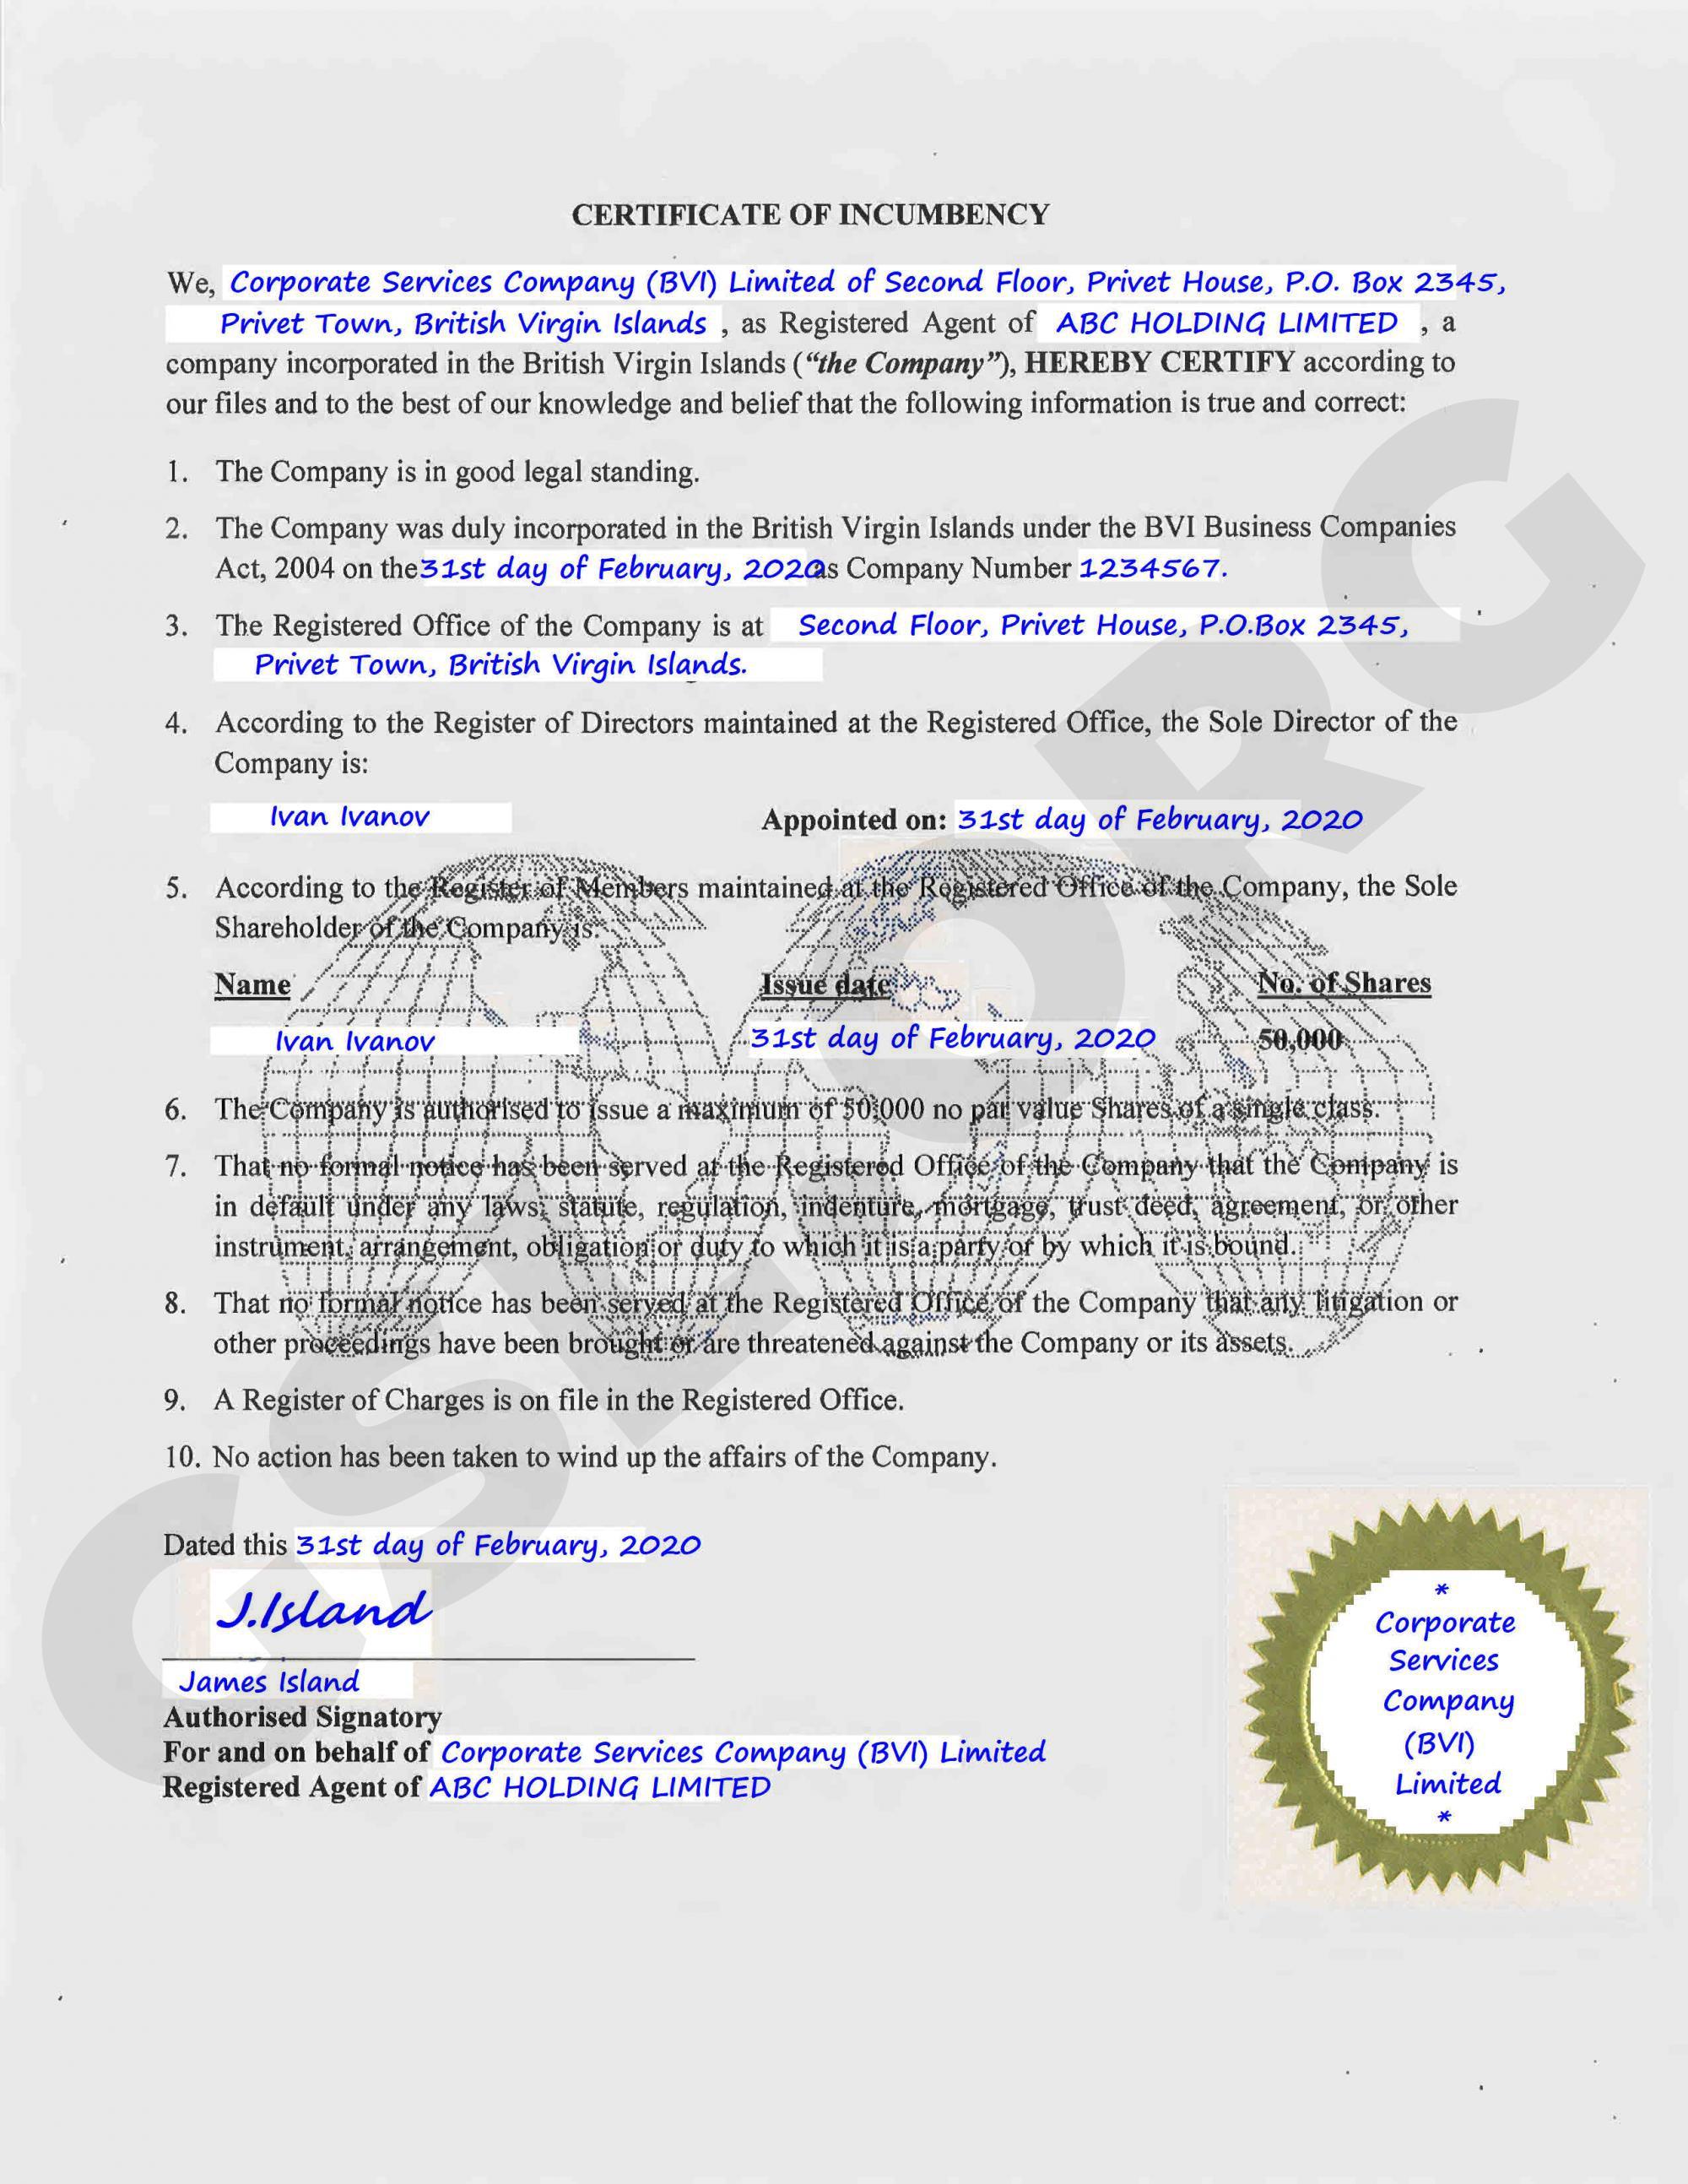 Образец Certificate of Incumbency